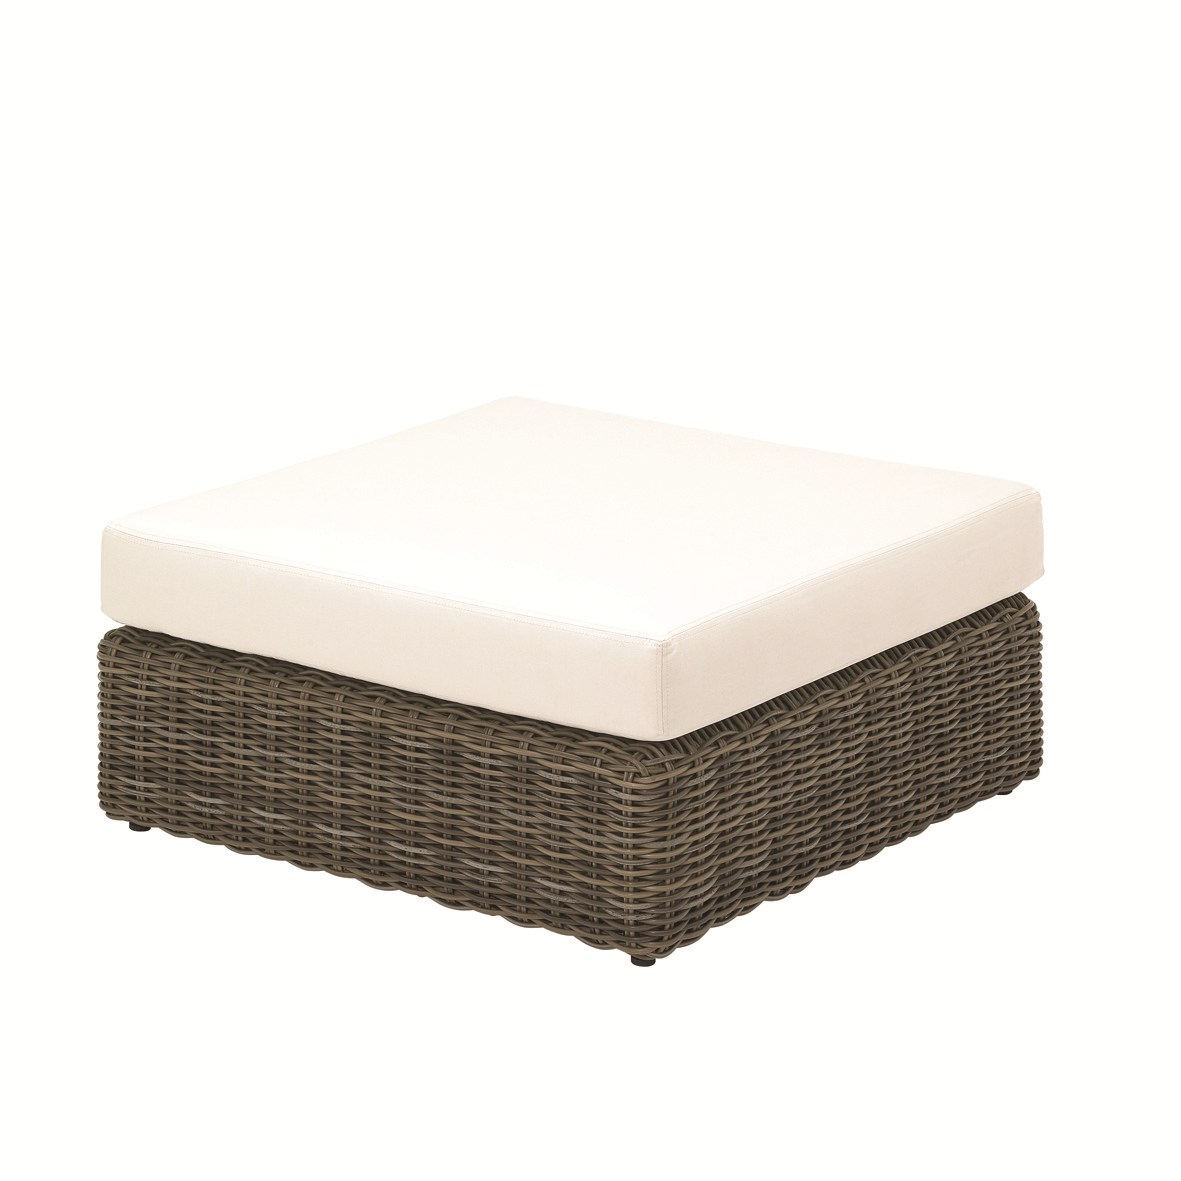 pouf de jardin carr e en r sine tress e collection havana by gloster design povl eskildsen. Black Bedroom Furniture Sets. Home Design Ideas